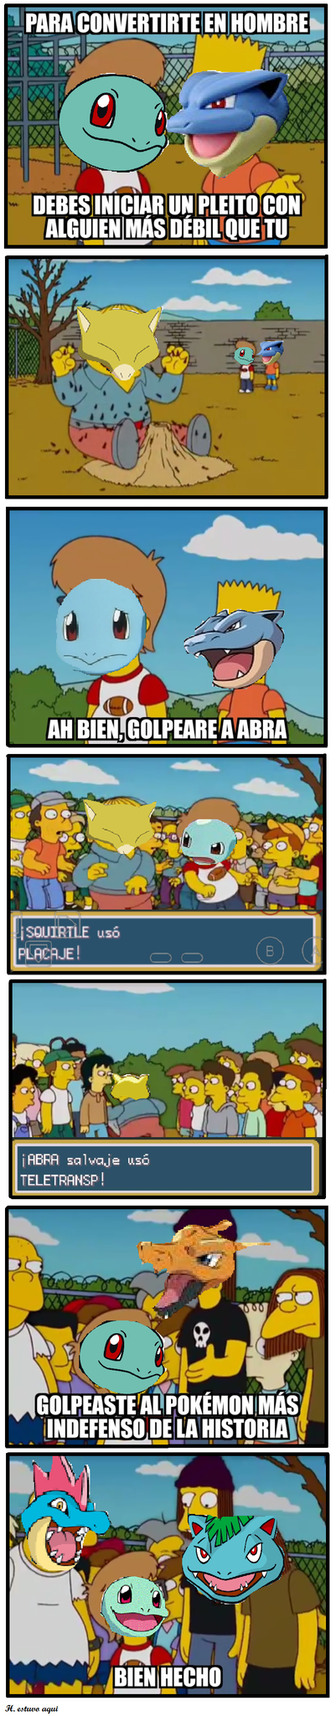 MegaUltraSuperHiperContra PokeMeme